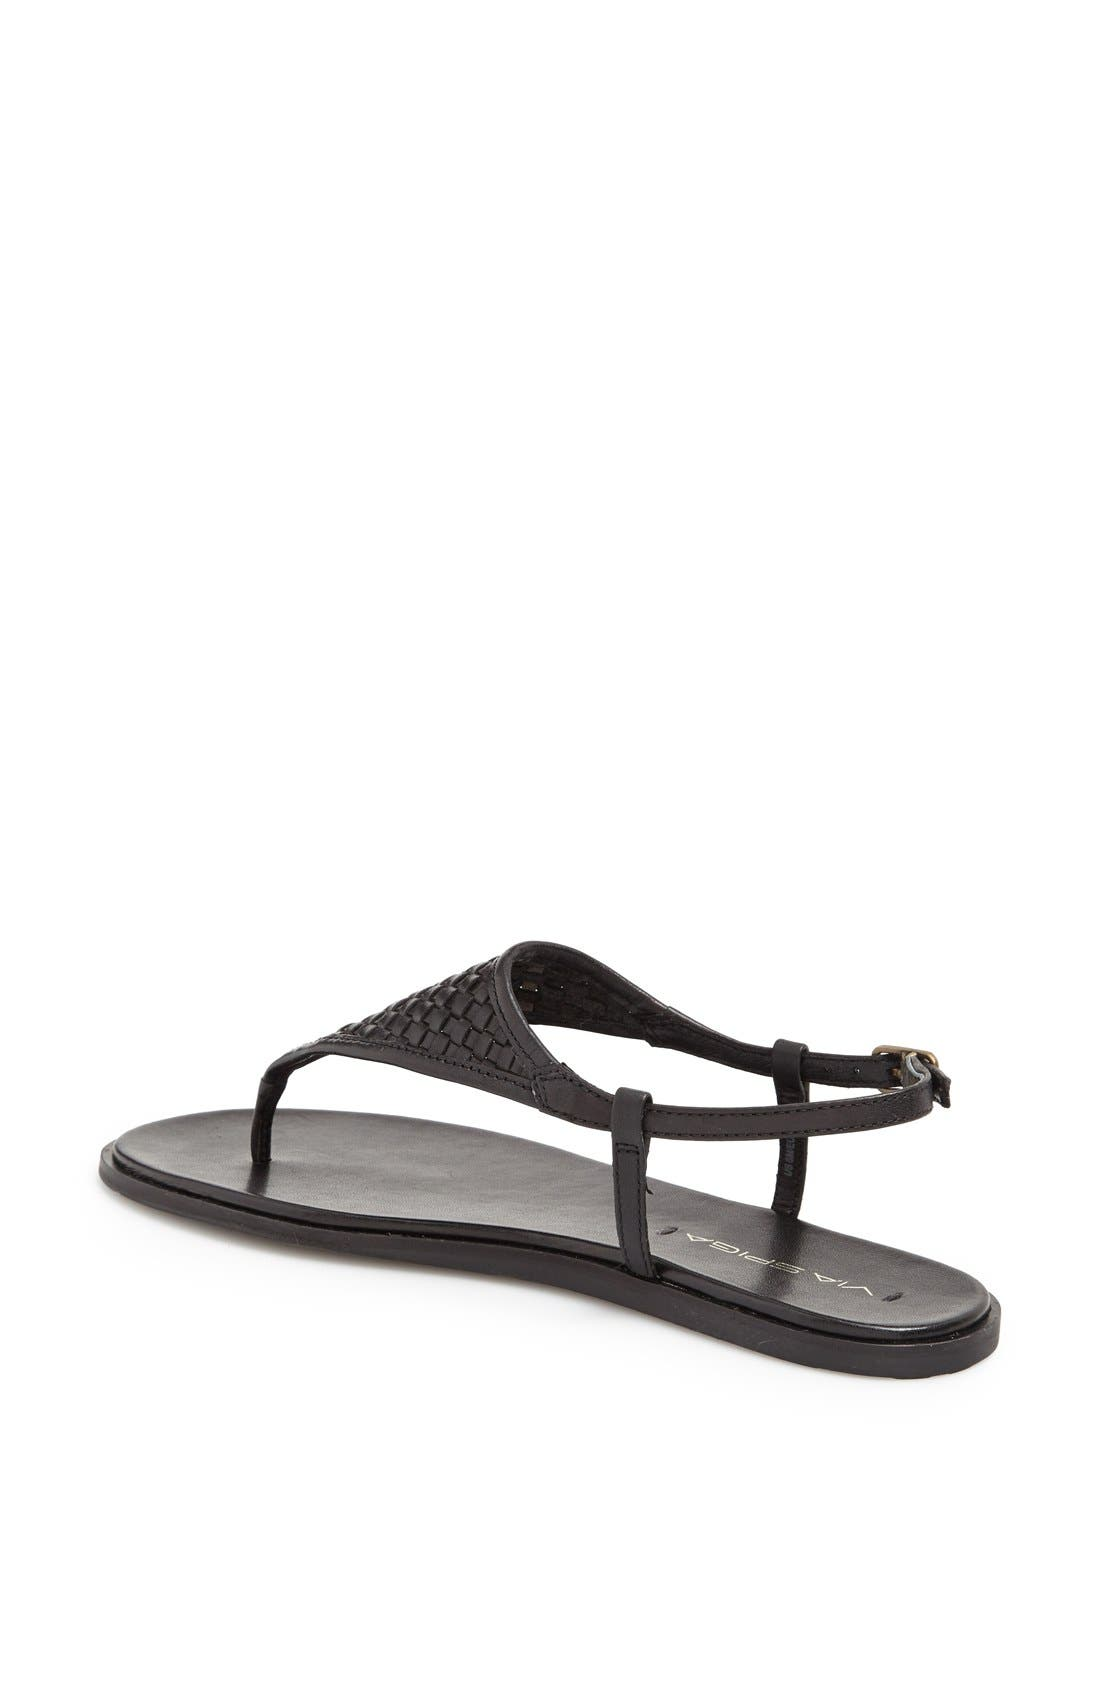 Alternate Image 2  - Via Spiga 'Aislin' Sandal